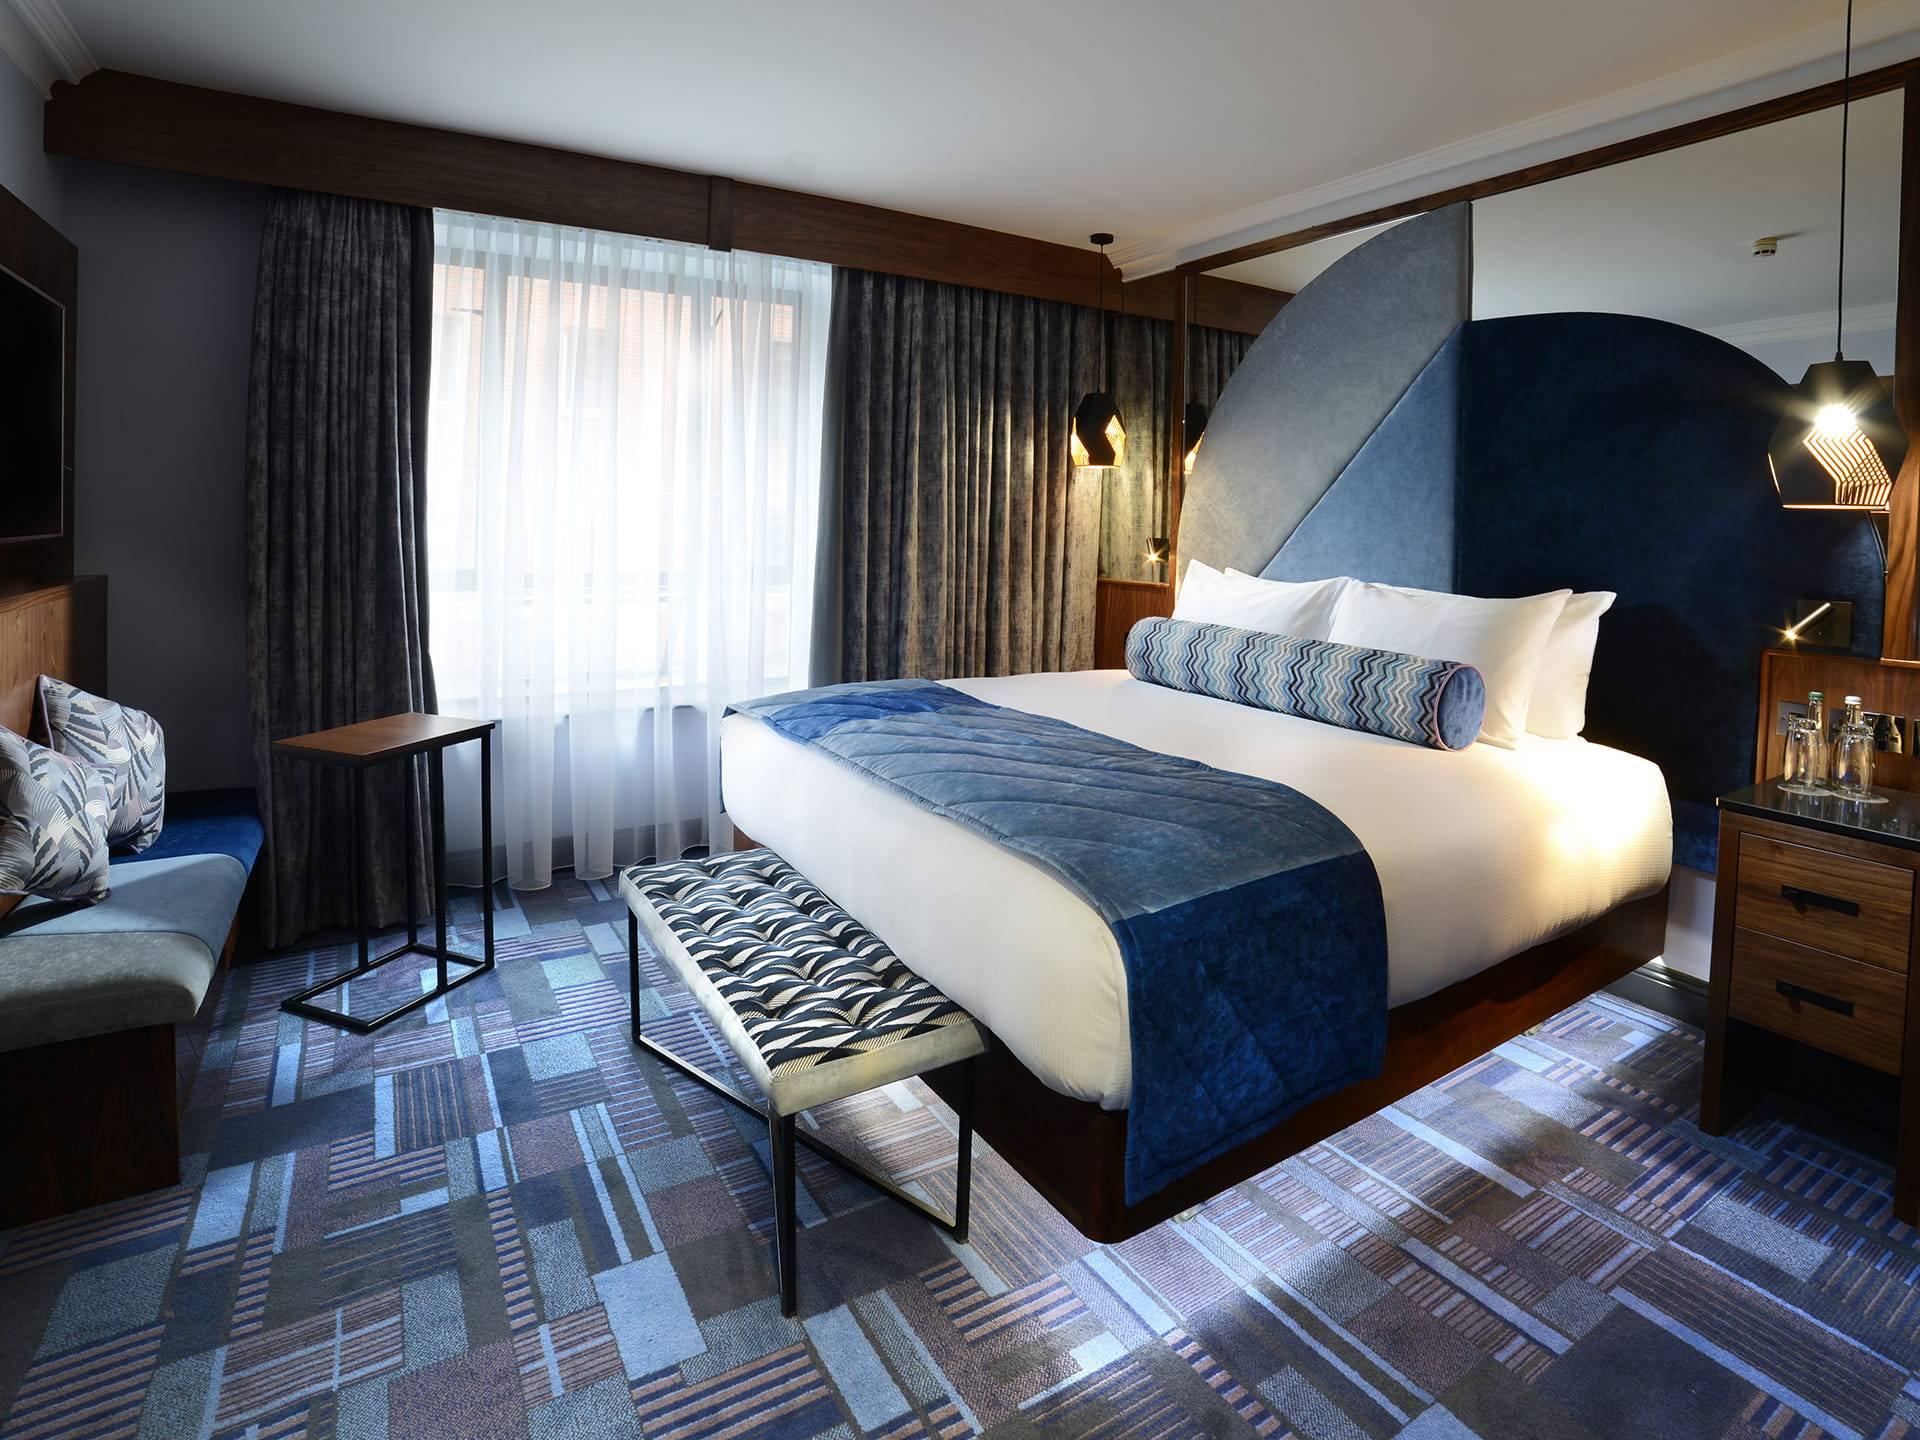 Arthaus Executive Room -Blue style room